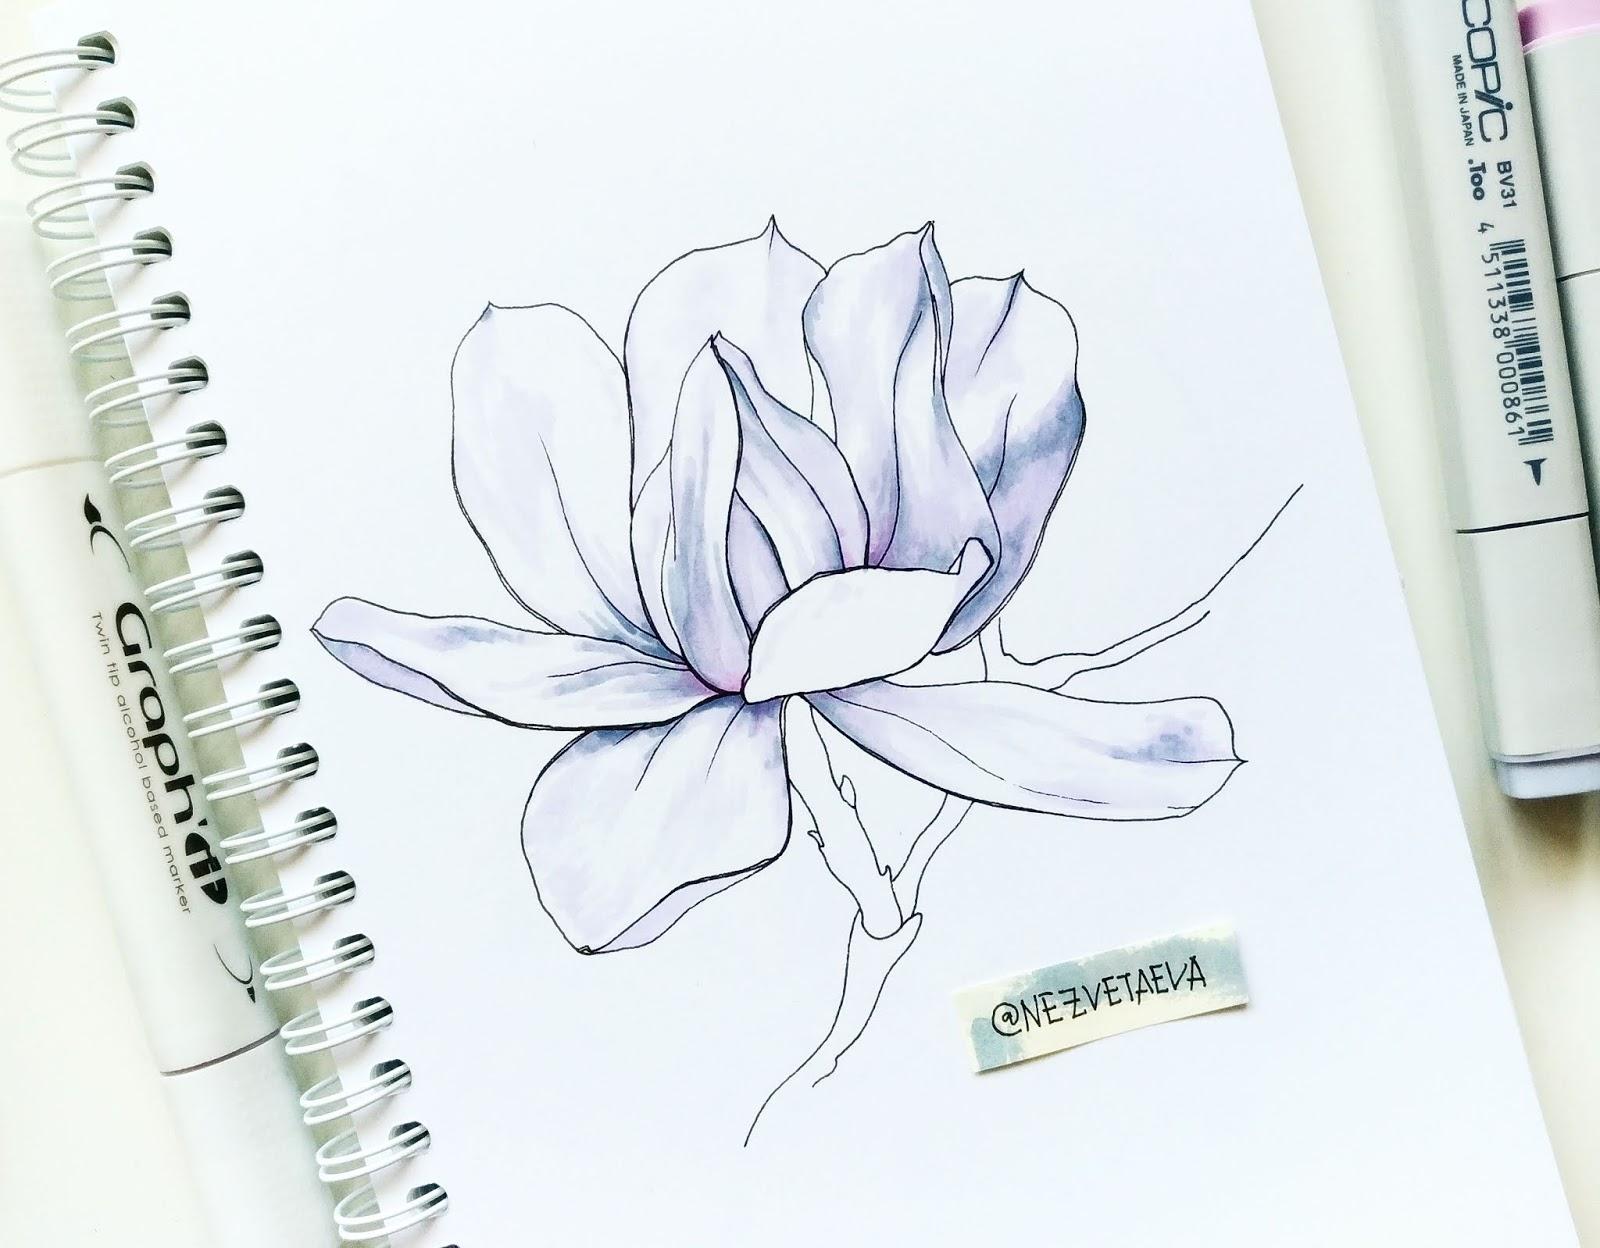 Sketchbook tour. My first flowers, Sonia Nezvetaeva, artist diary